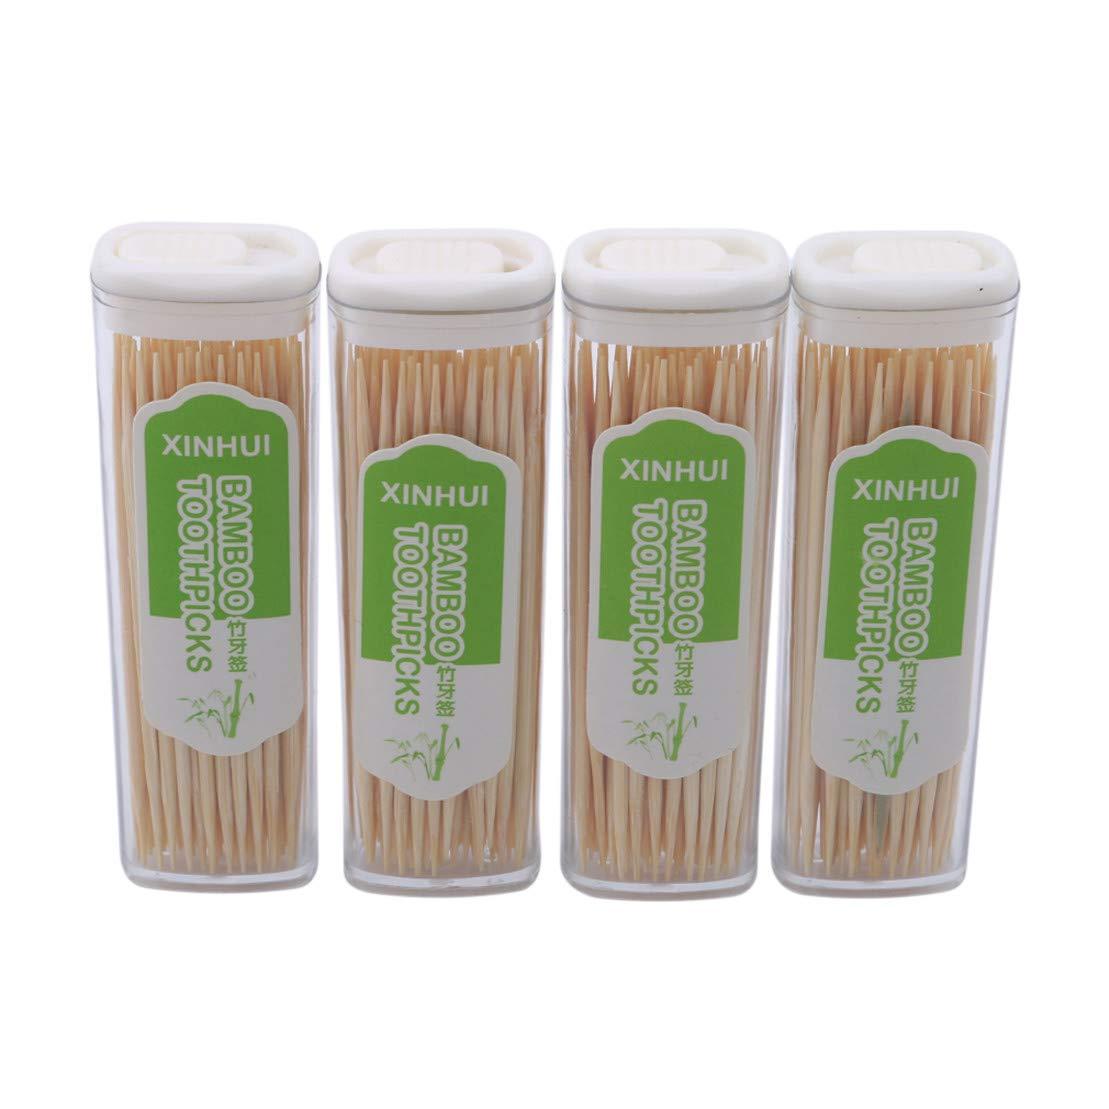 Kissherely 4 Boxen/Set Bambuszahnstocher Mit Box Glatte Oberfläche Cocktail Sticks Haushalt Wegwerfzahnstocher